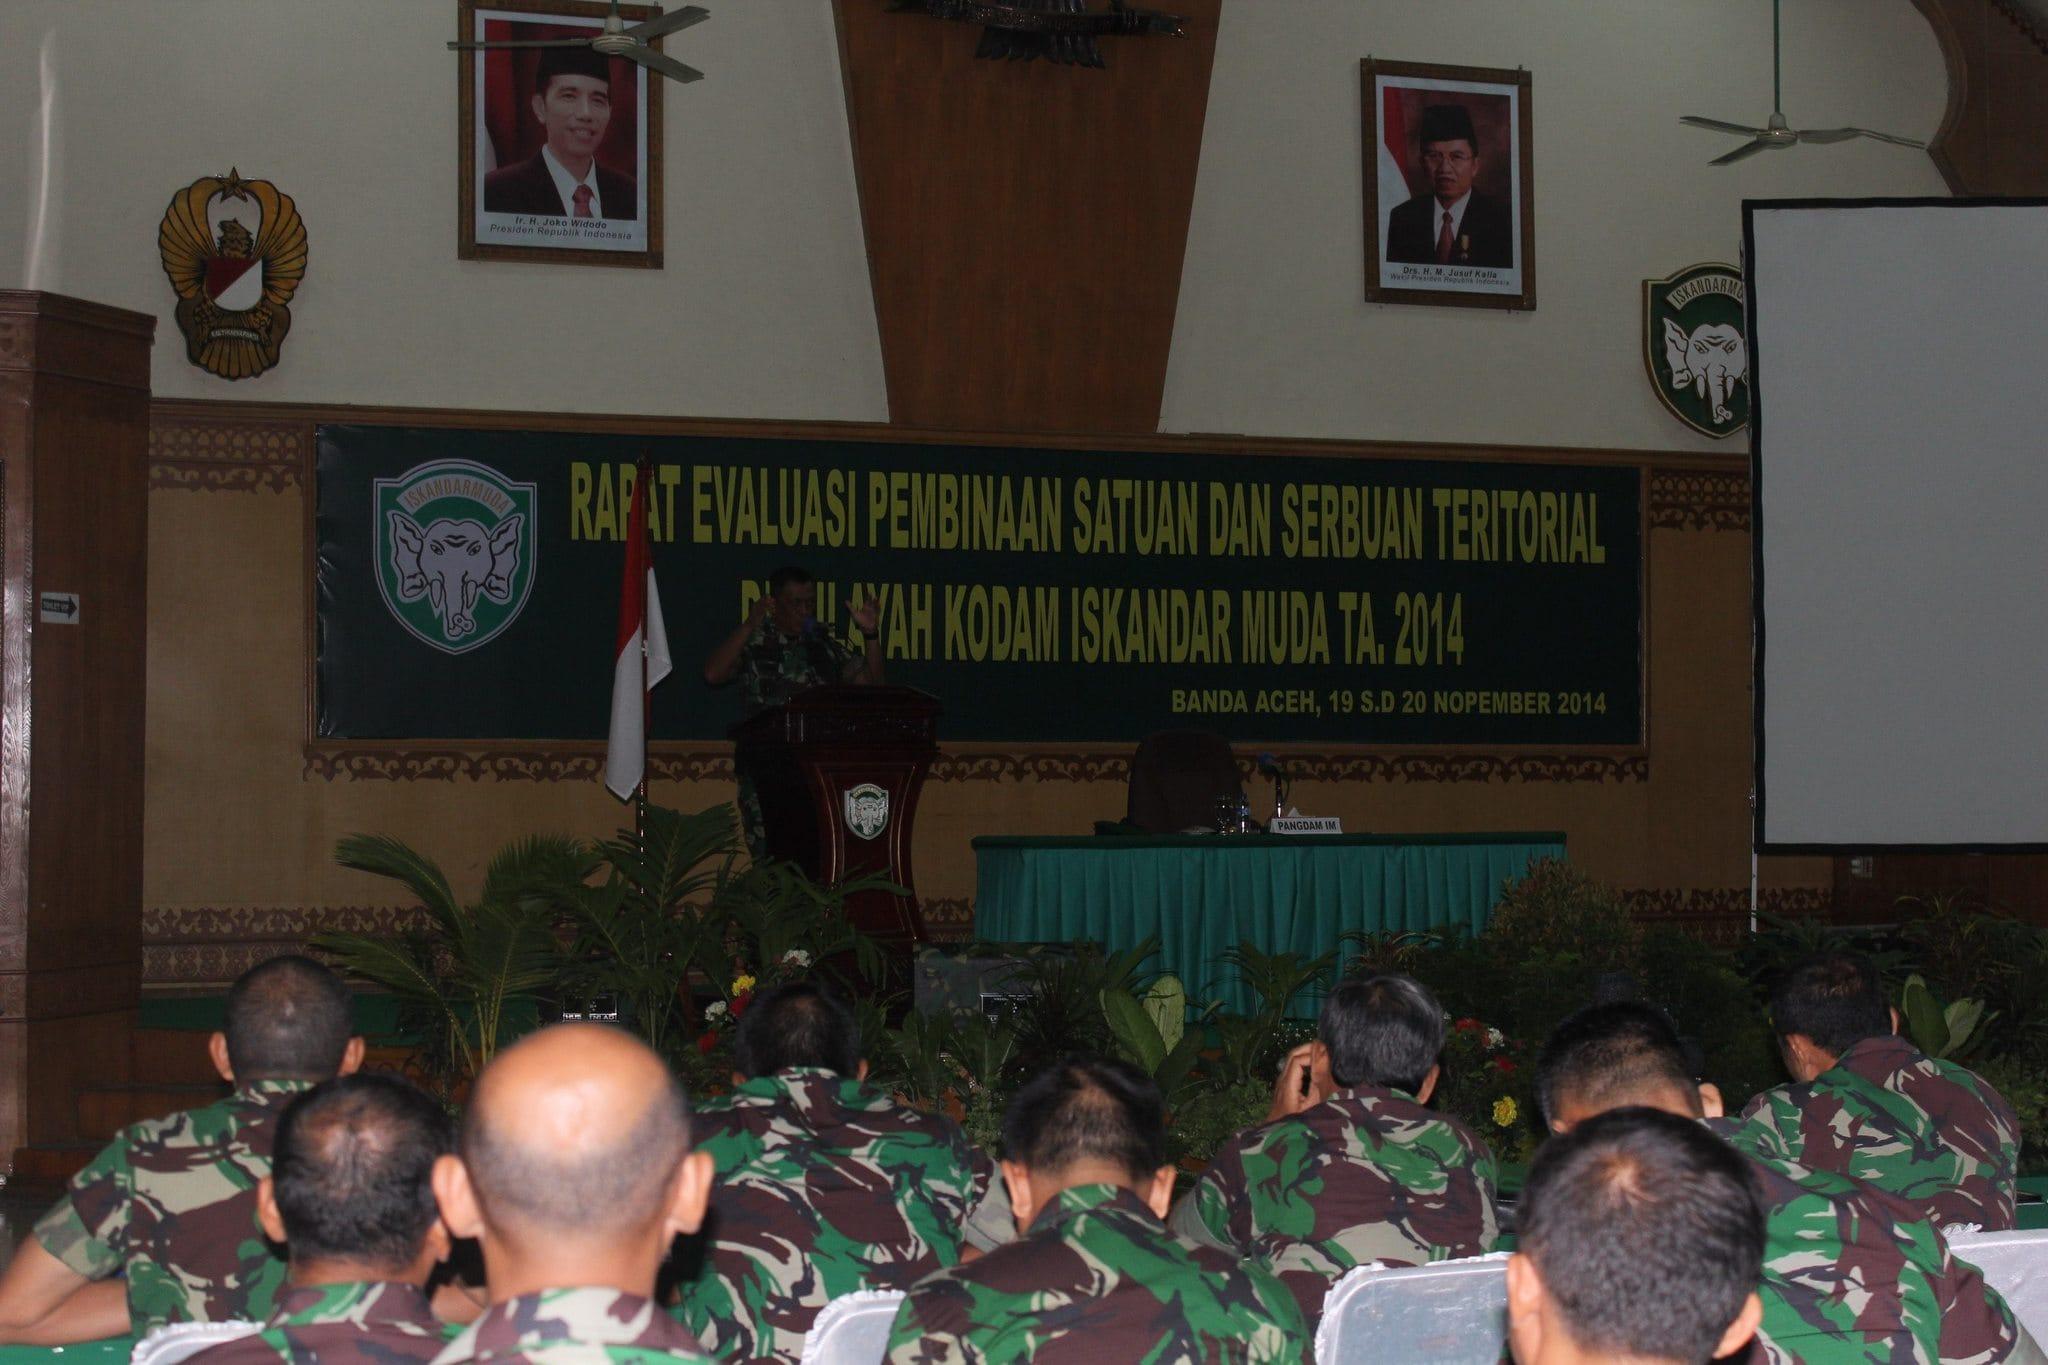 Pangdam IM Buka Rapat Evaluasi Binsat Dan Serbuan Teritorial Kodam IM